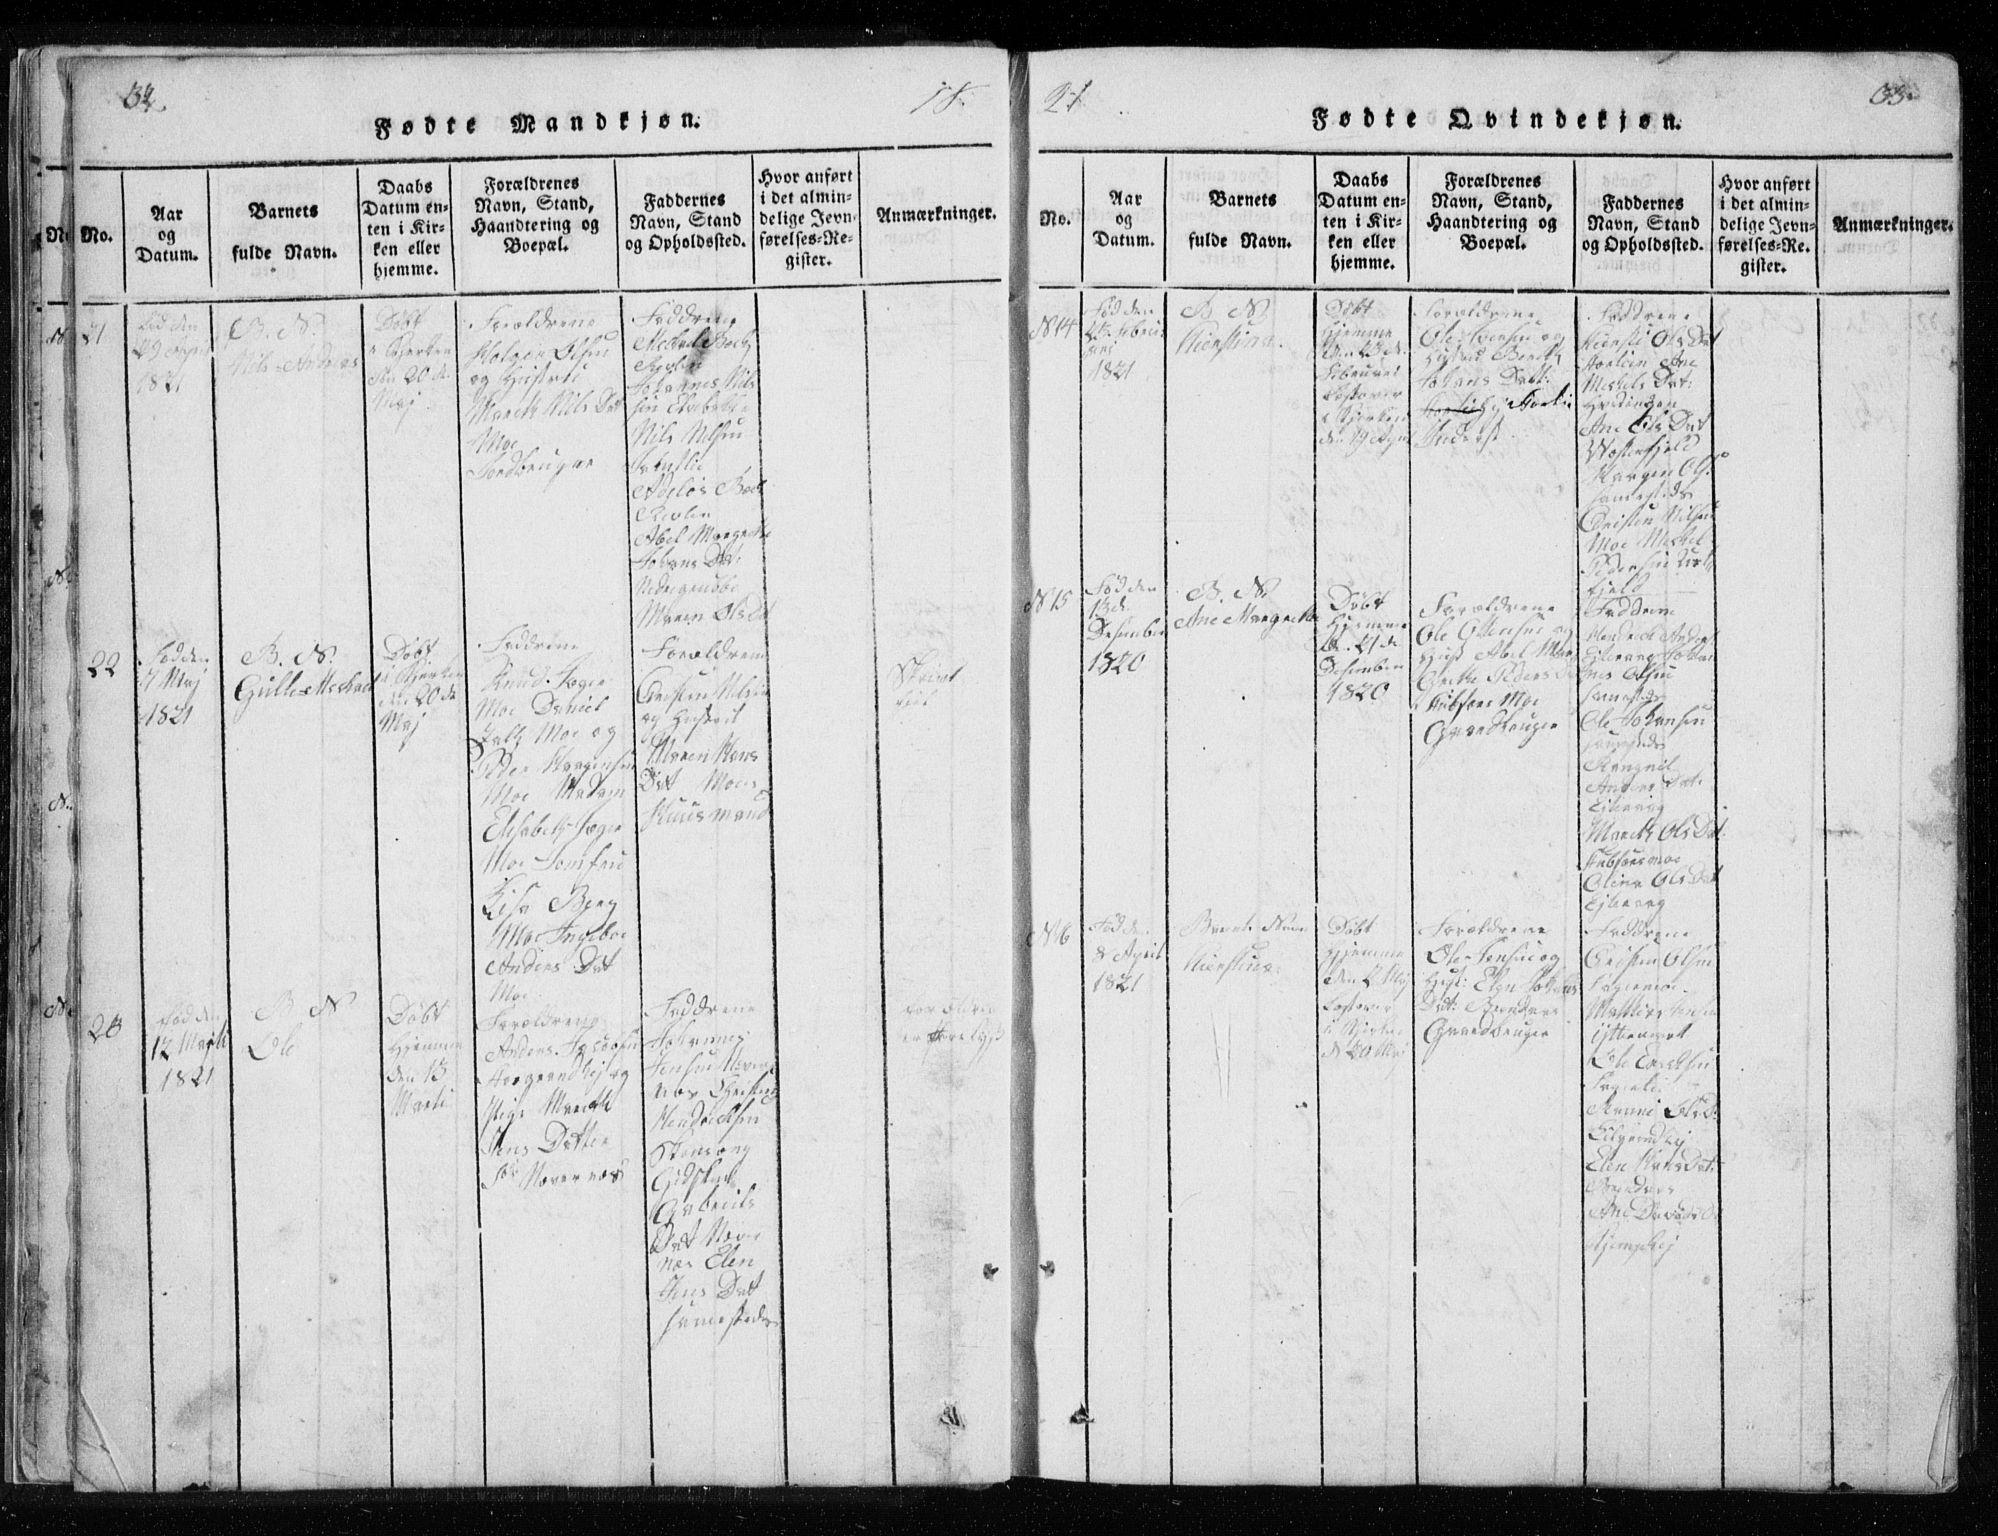 SAT, Ministerialprotokoller, klokkerbøker og fødselsregistre - Nordland, 827/L0412: Klokkerbok nr. 827C01, 1820-1841, s. 32-33